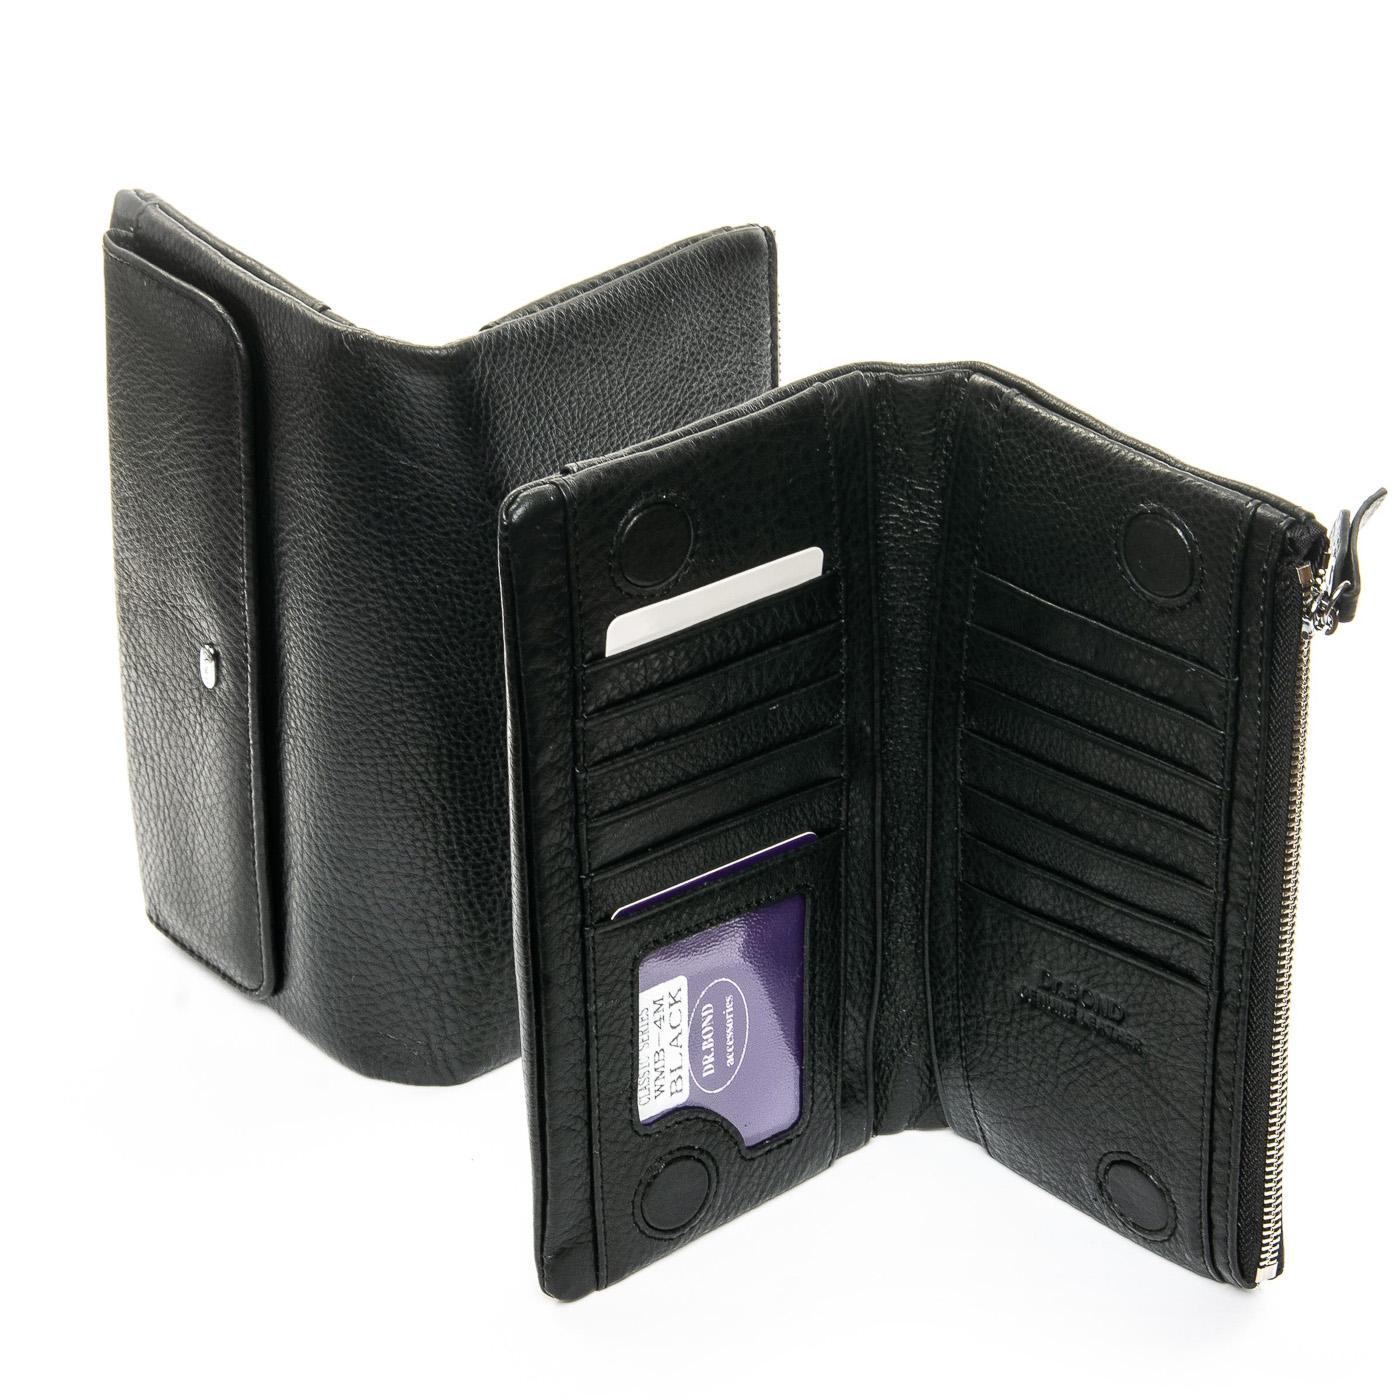 Кошелек Classic кожа DR. BOND WMB-4M black color - фото 4